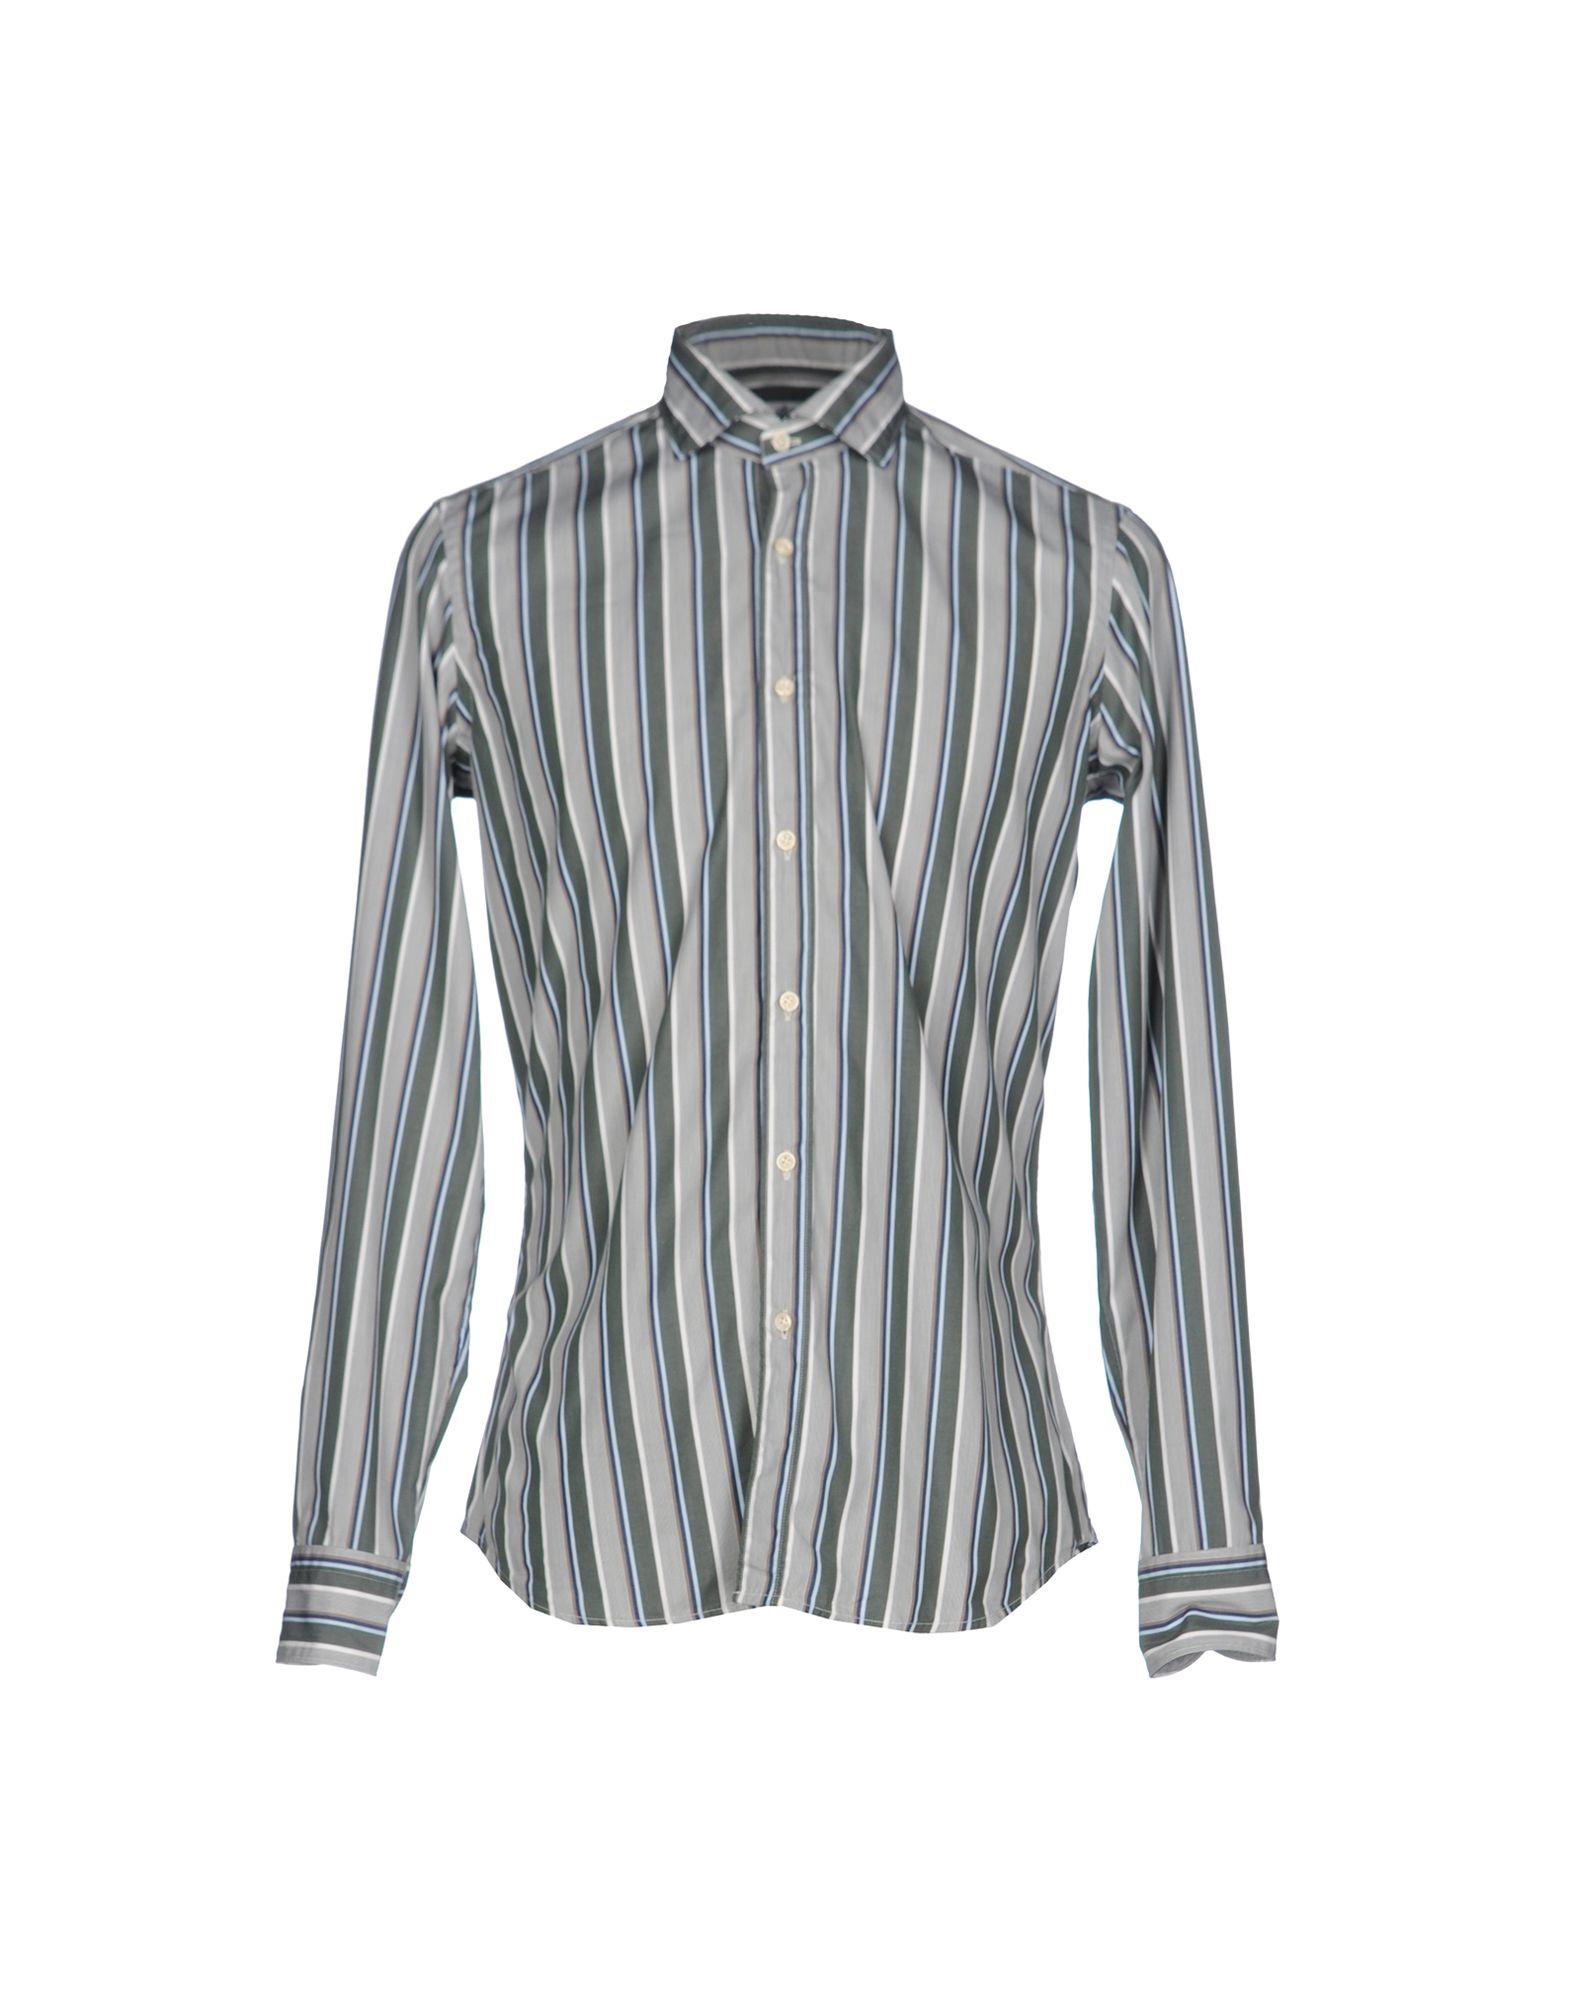 цена  ALEA Pубашка  онлайн в 2017 году